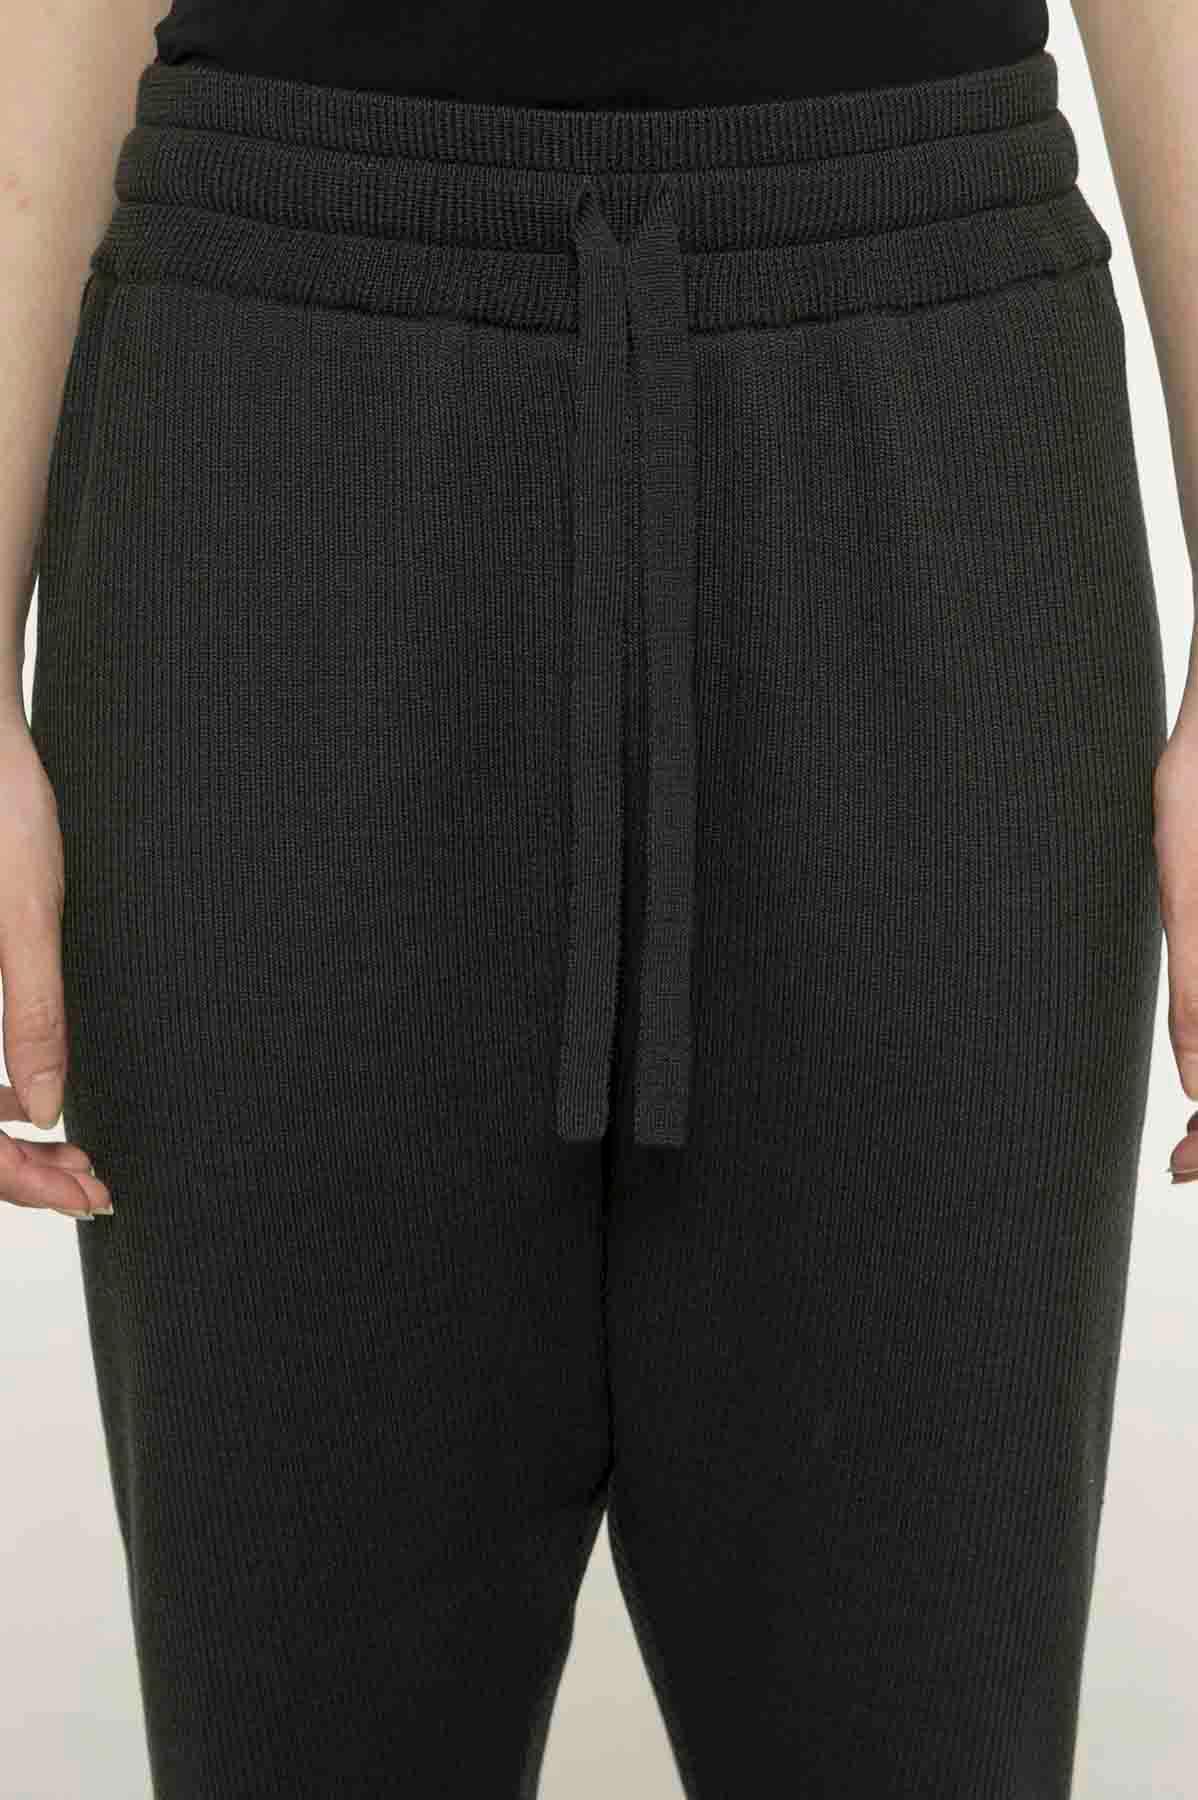 RISMATbyY这款精美羊毛侧面配色罗纹裤